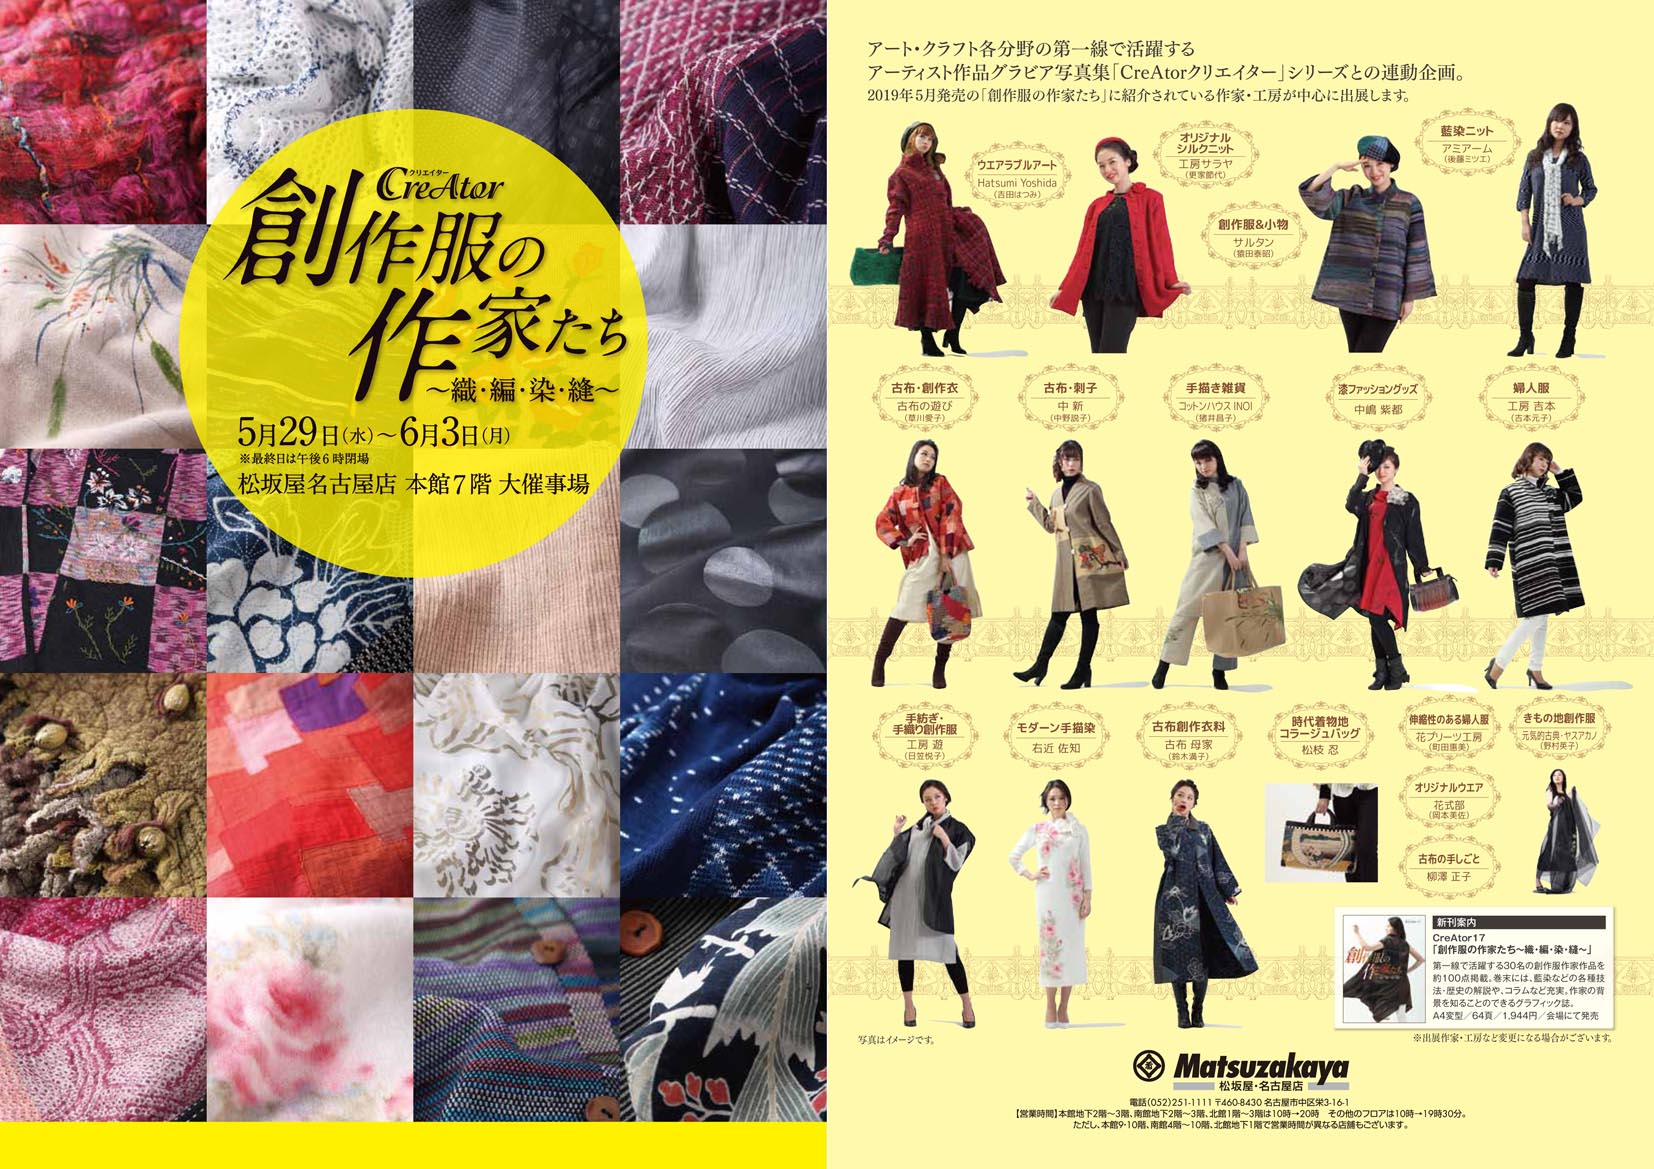 CreAtor創作服の作家たち展/CreAtor17創作服の作家たち~織・編・染・縫~出版記念展